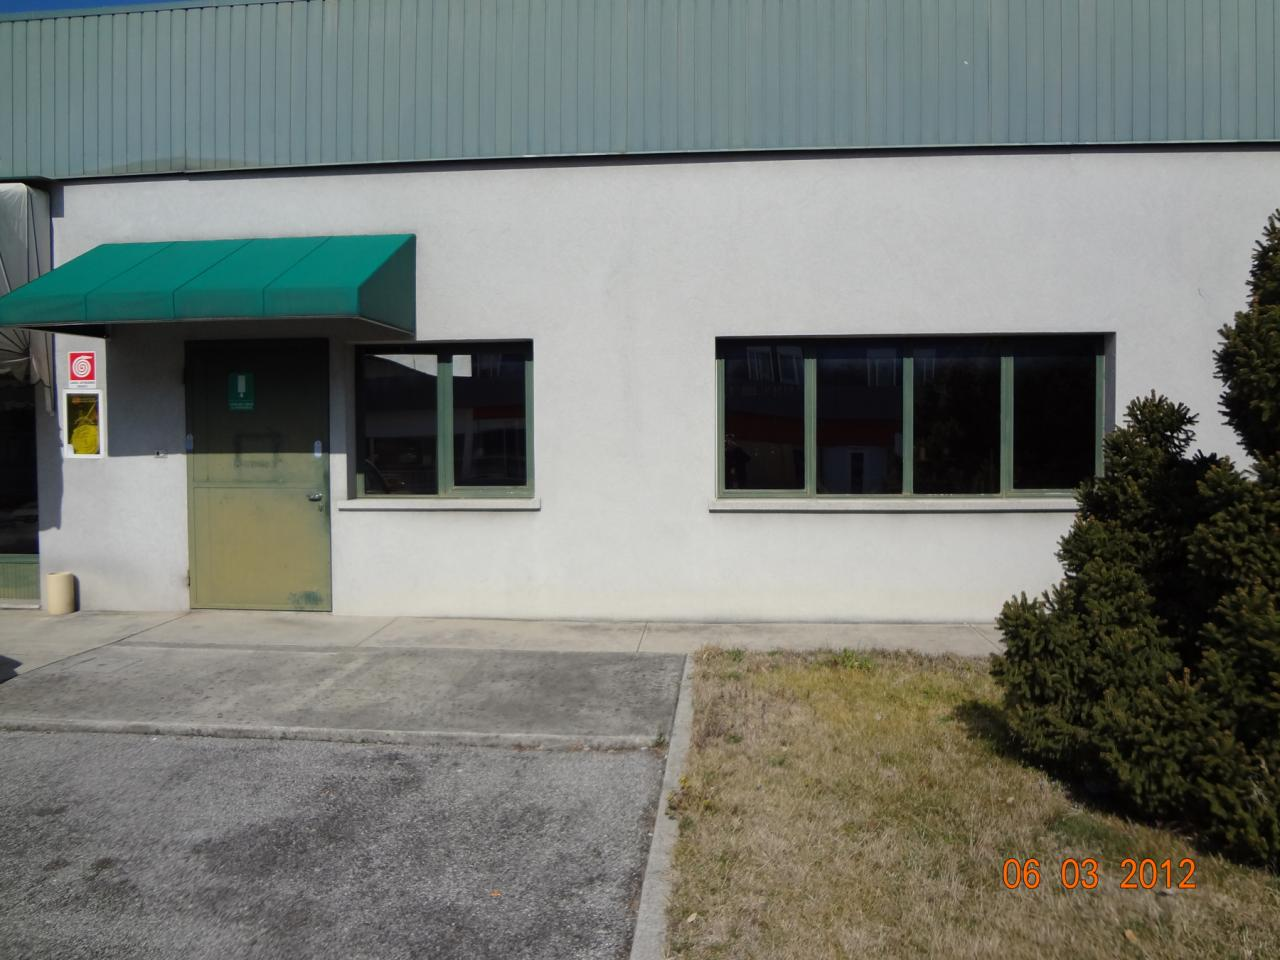 Affitto locale commerciale buono a spilimbergo rif 98 - Agenzie immobiliari spilimbergo ...